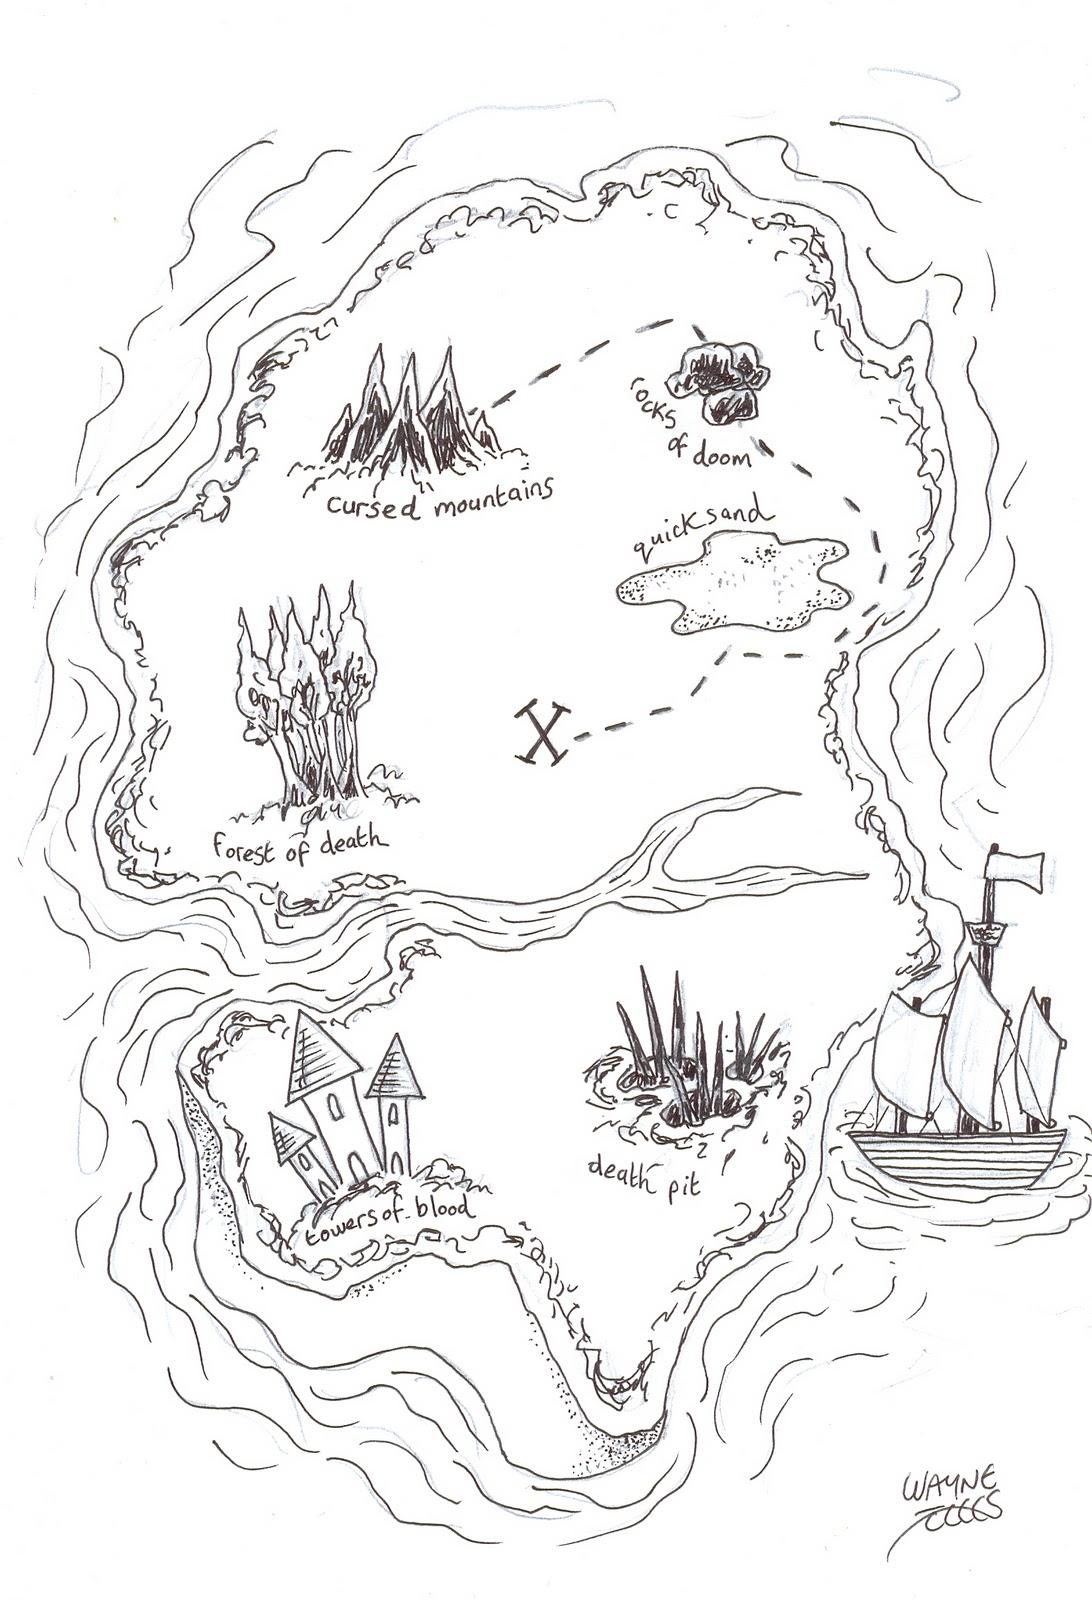 Wayne Tully Horror Art How To Draw And Create A Treasure